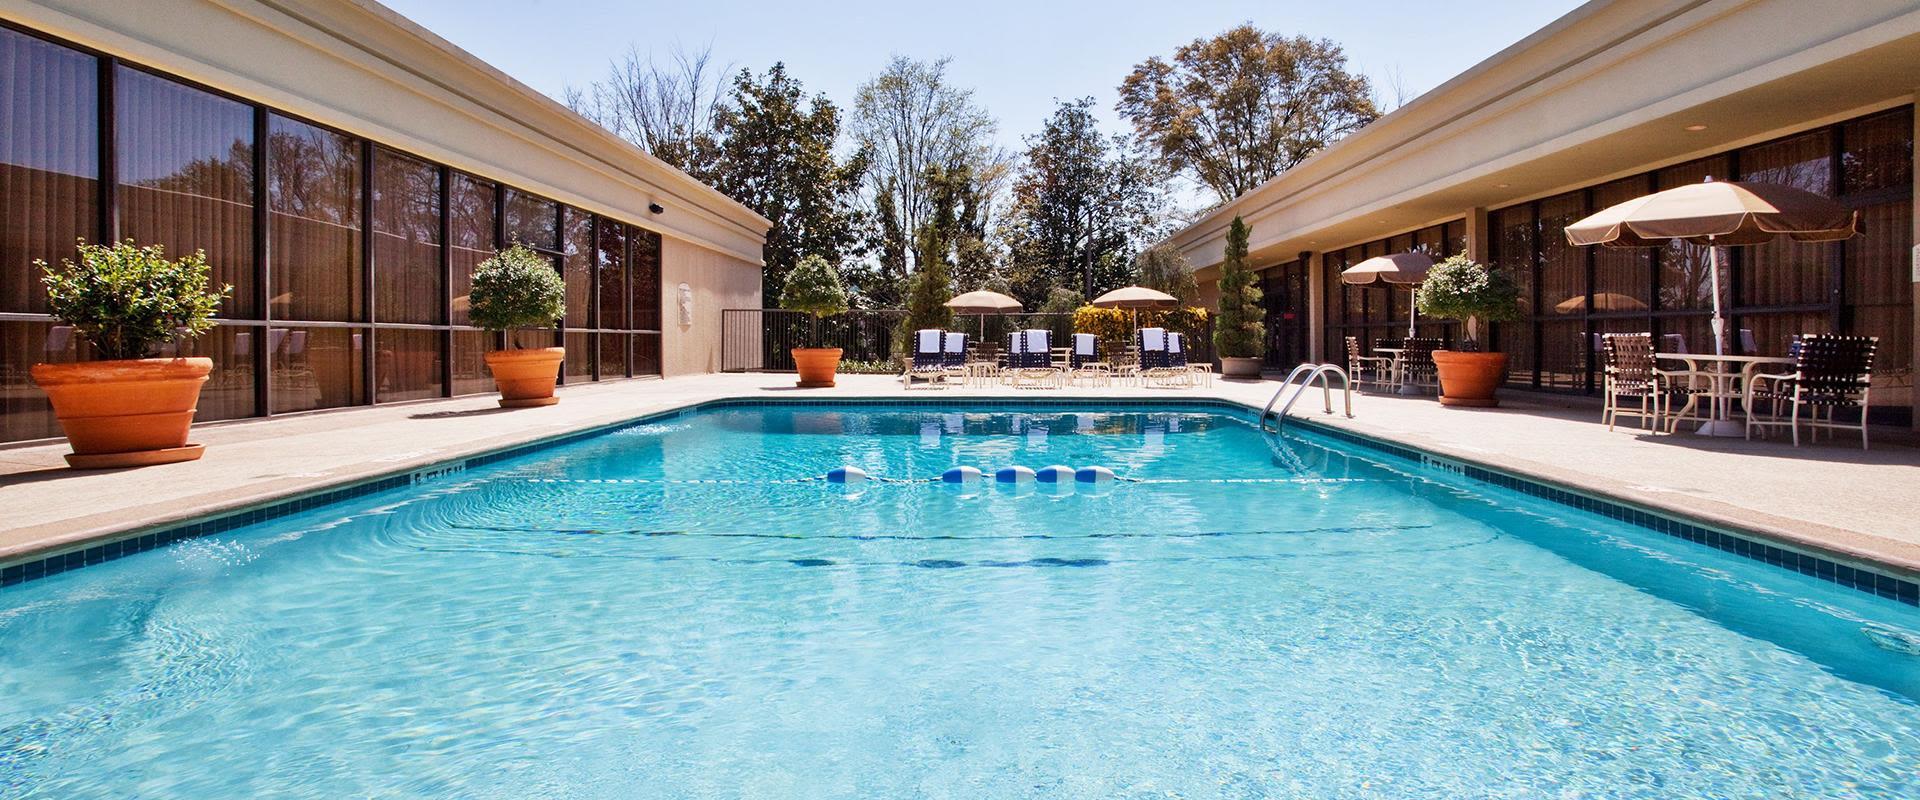 Atlanta Hotel Outdoor Swimming Pool